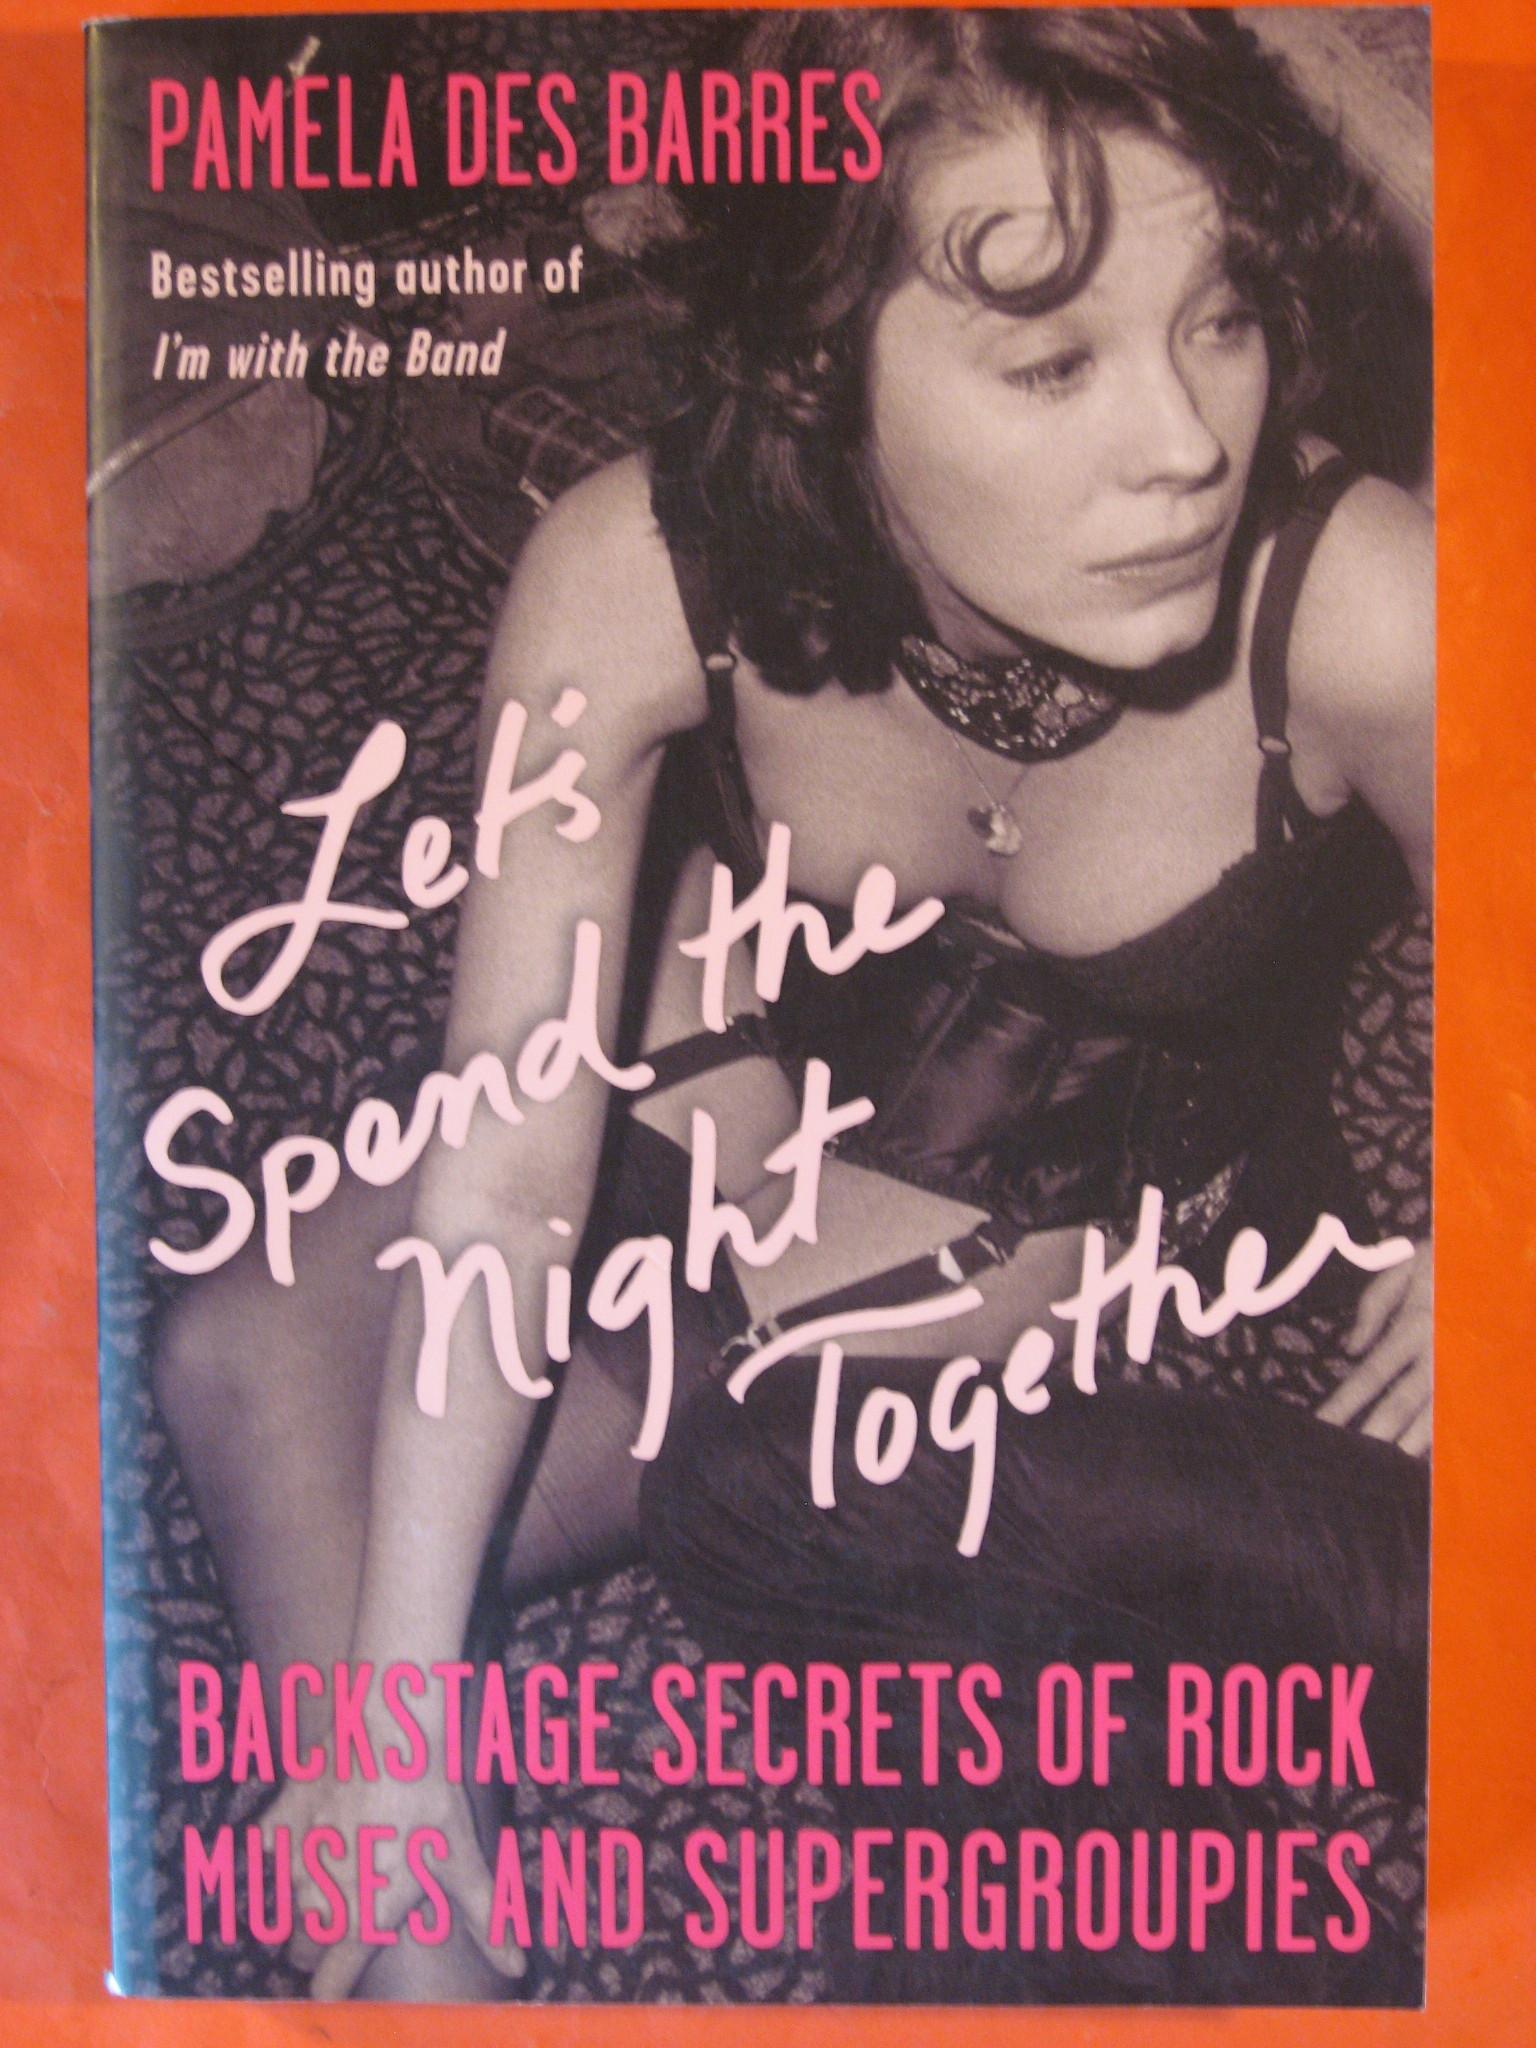 Let's Spend the Night Together: Backstage Secrets of Rock Muses and Supergroupies, Des Barres, Pamela